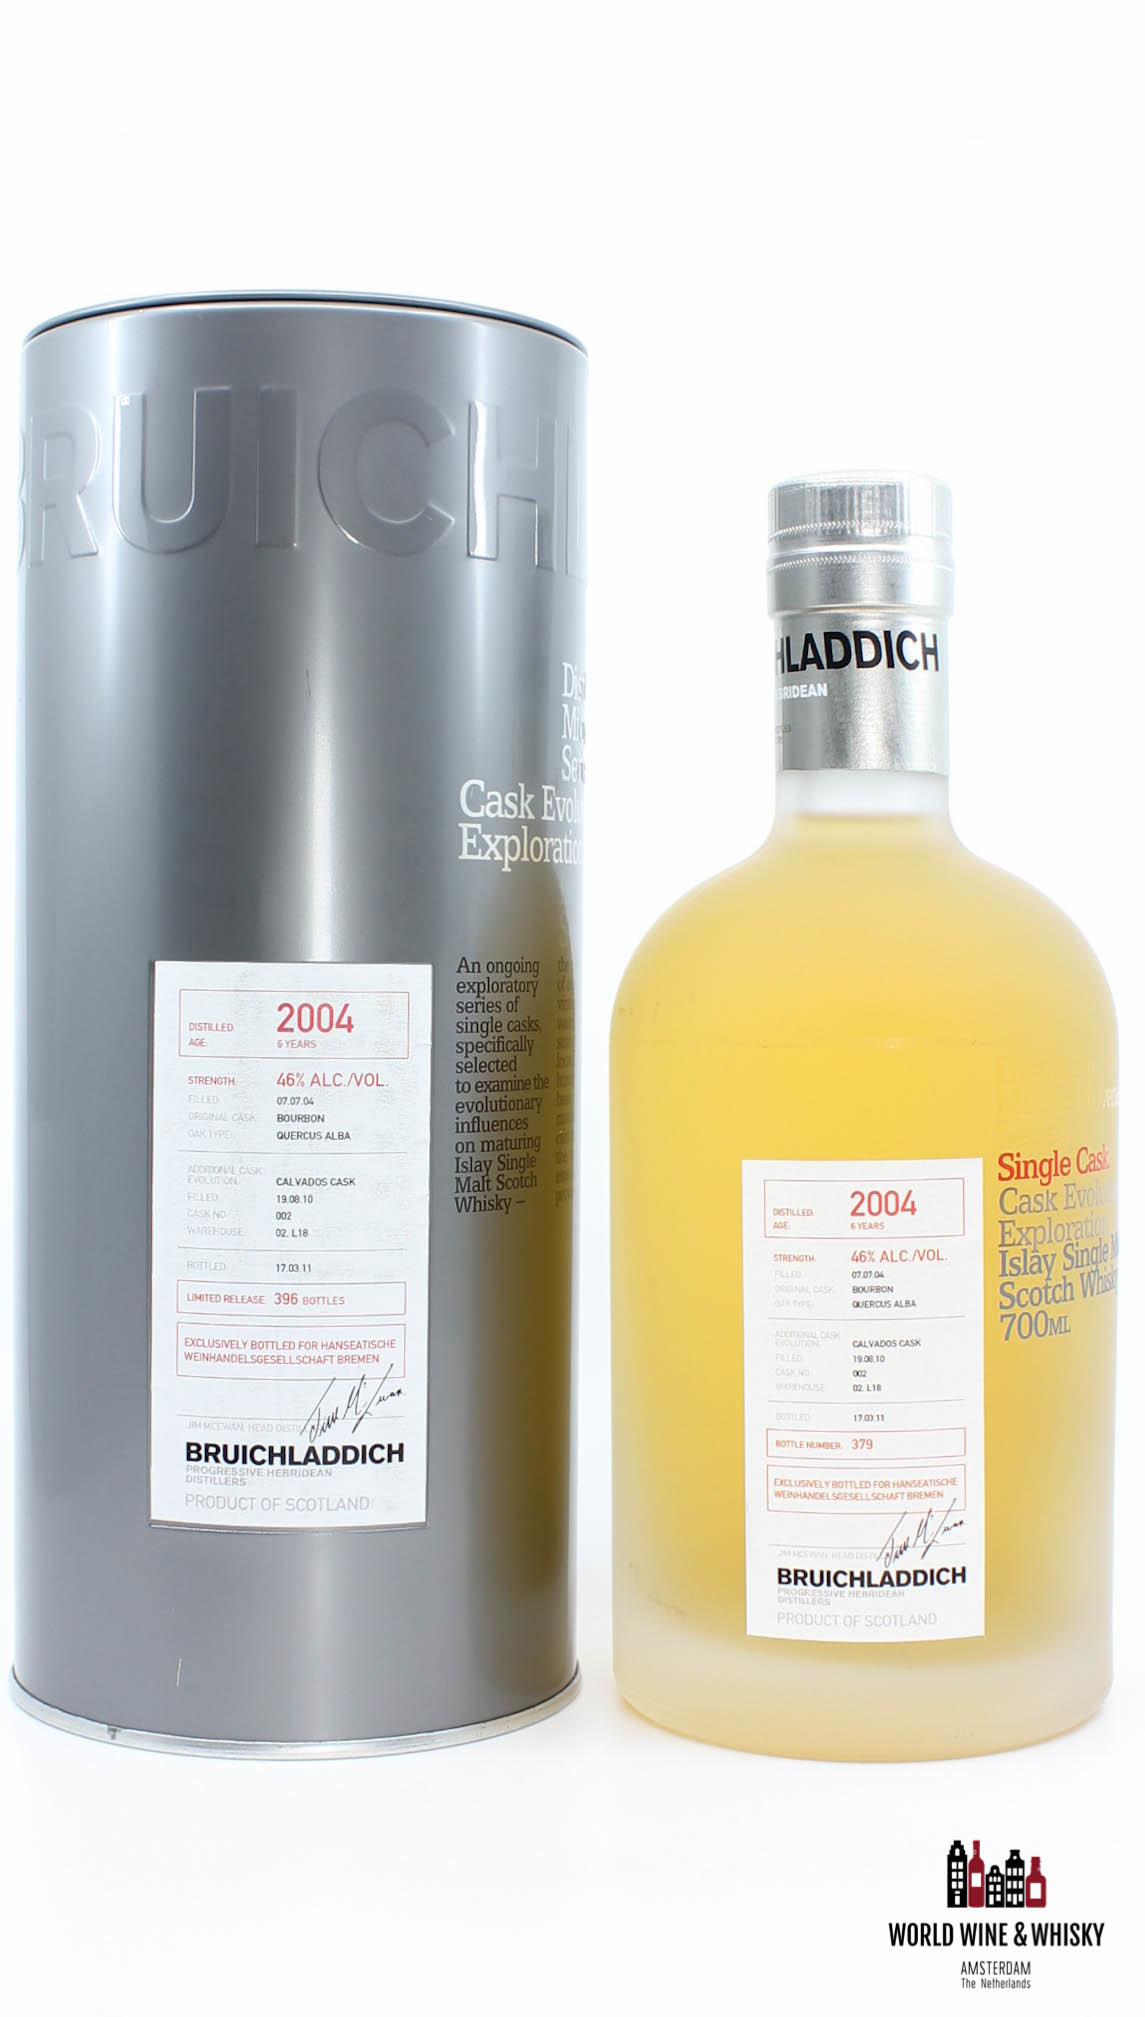 Bruichladdich Bruichladdich 6 Years Old 2004 2011 (filled in 2010) Cask 002 46%